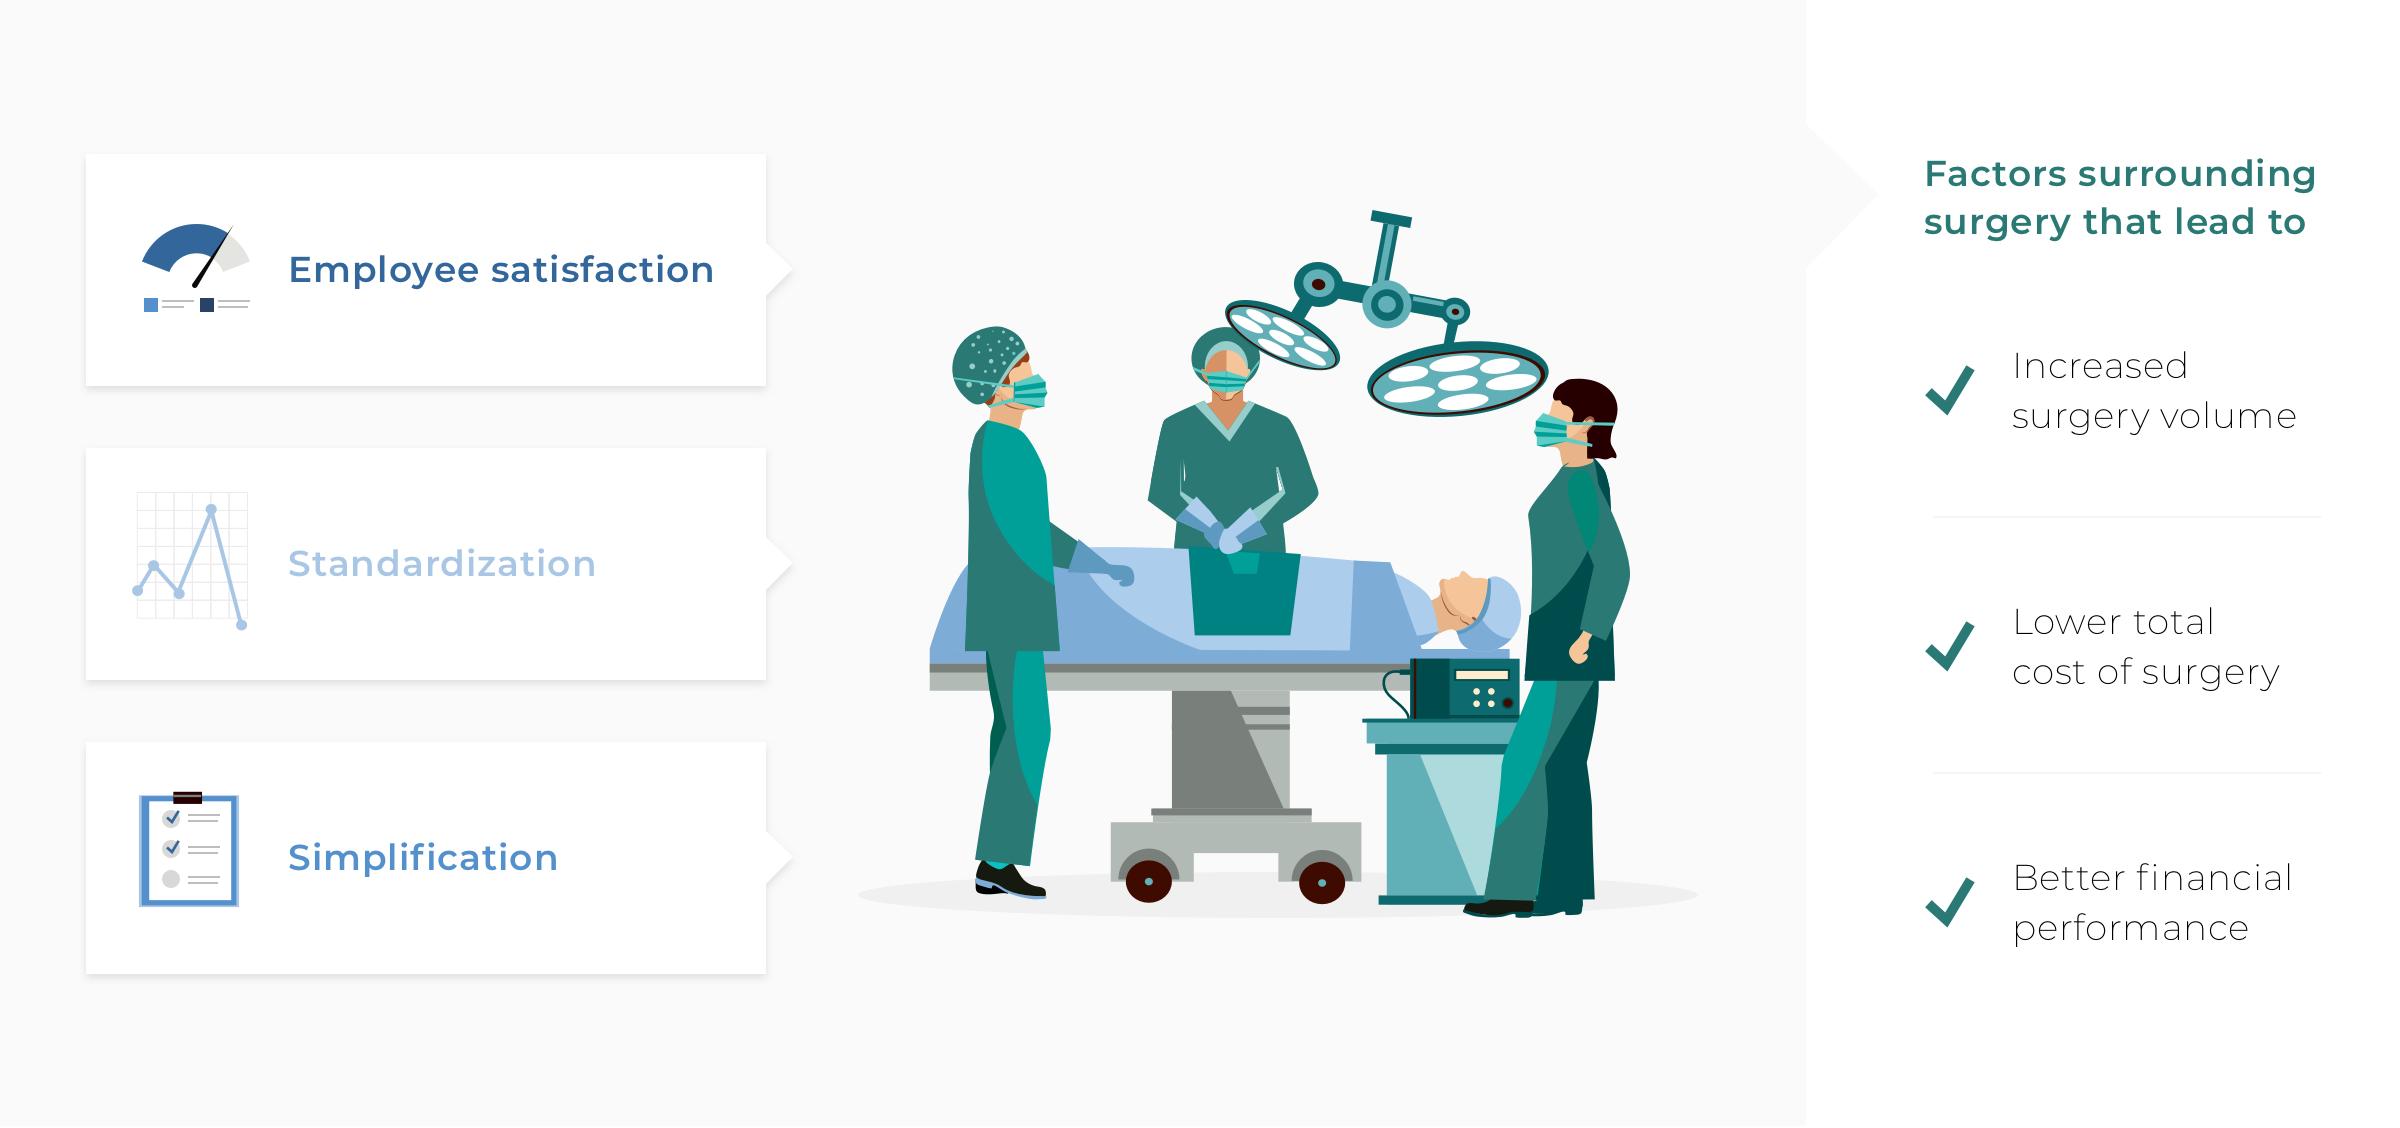 improvement opportunities operating room efficiency